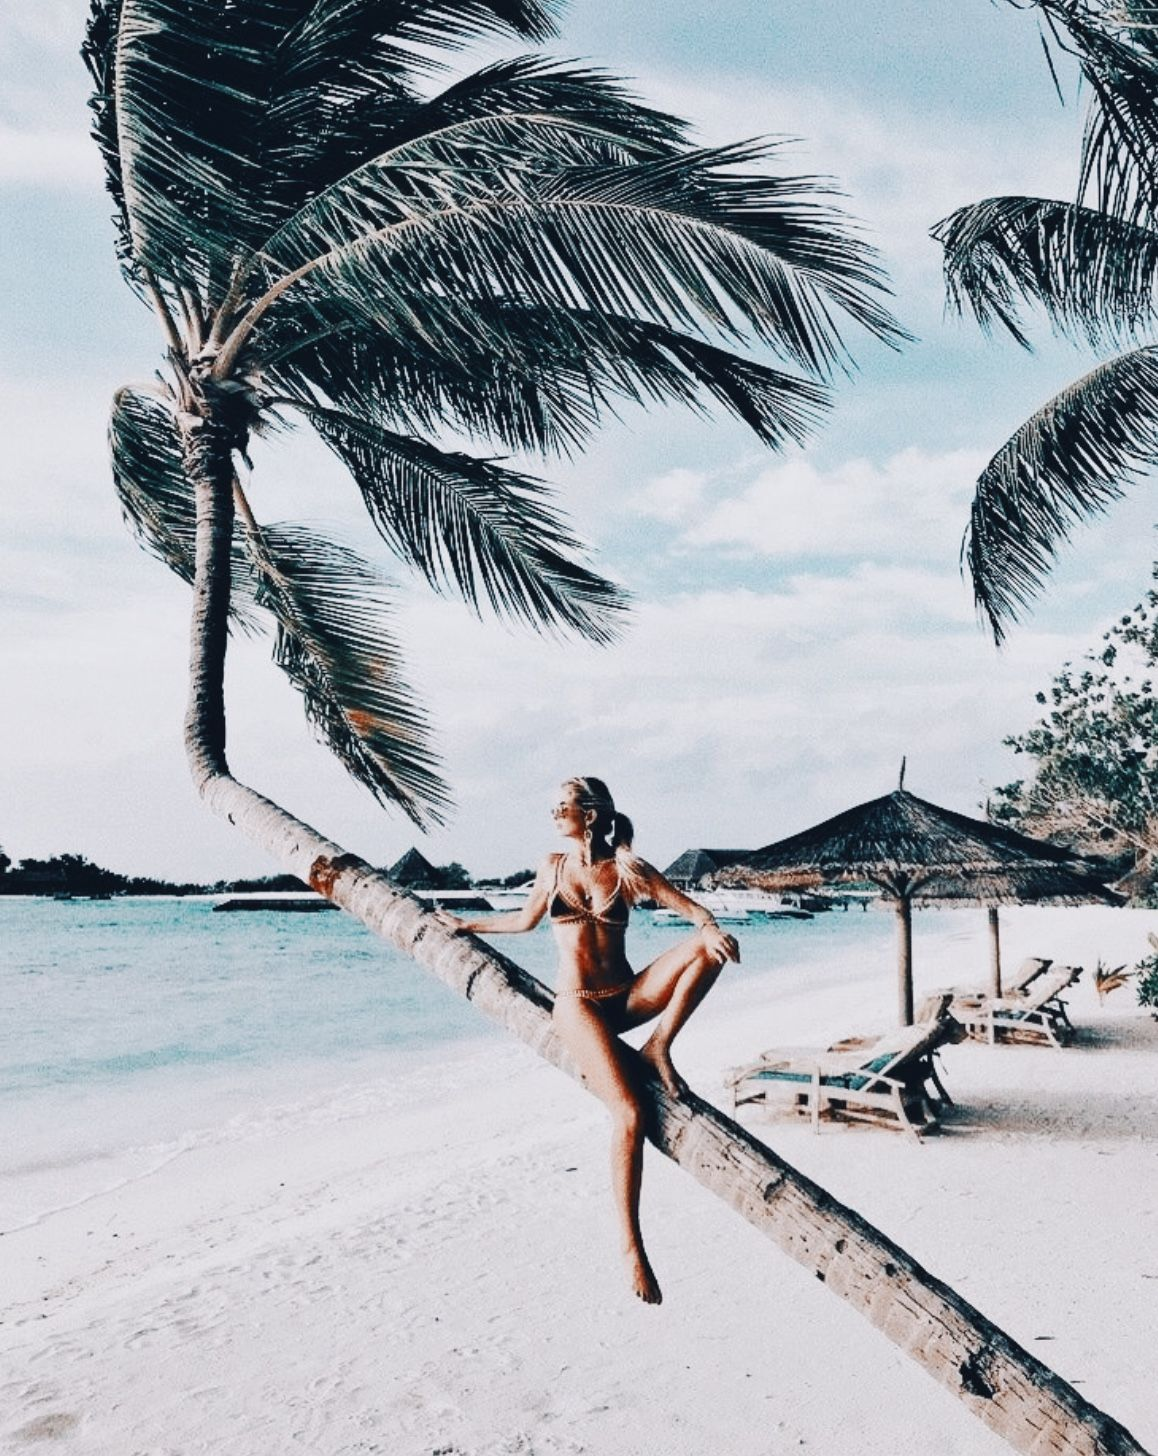 Sex Mia Quinn nudes (96 photos), Ass, Sideboobs, Selfie, underwear 2020